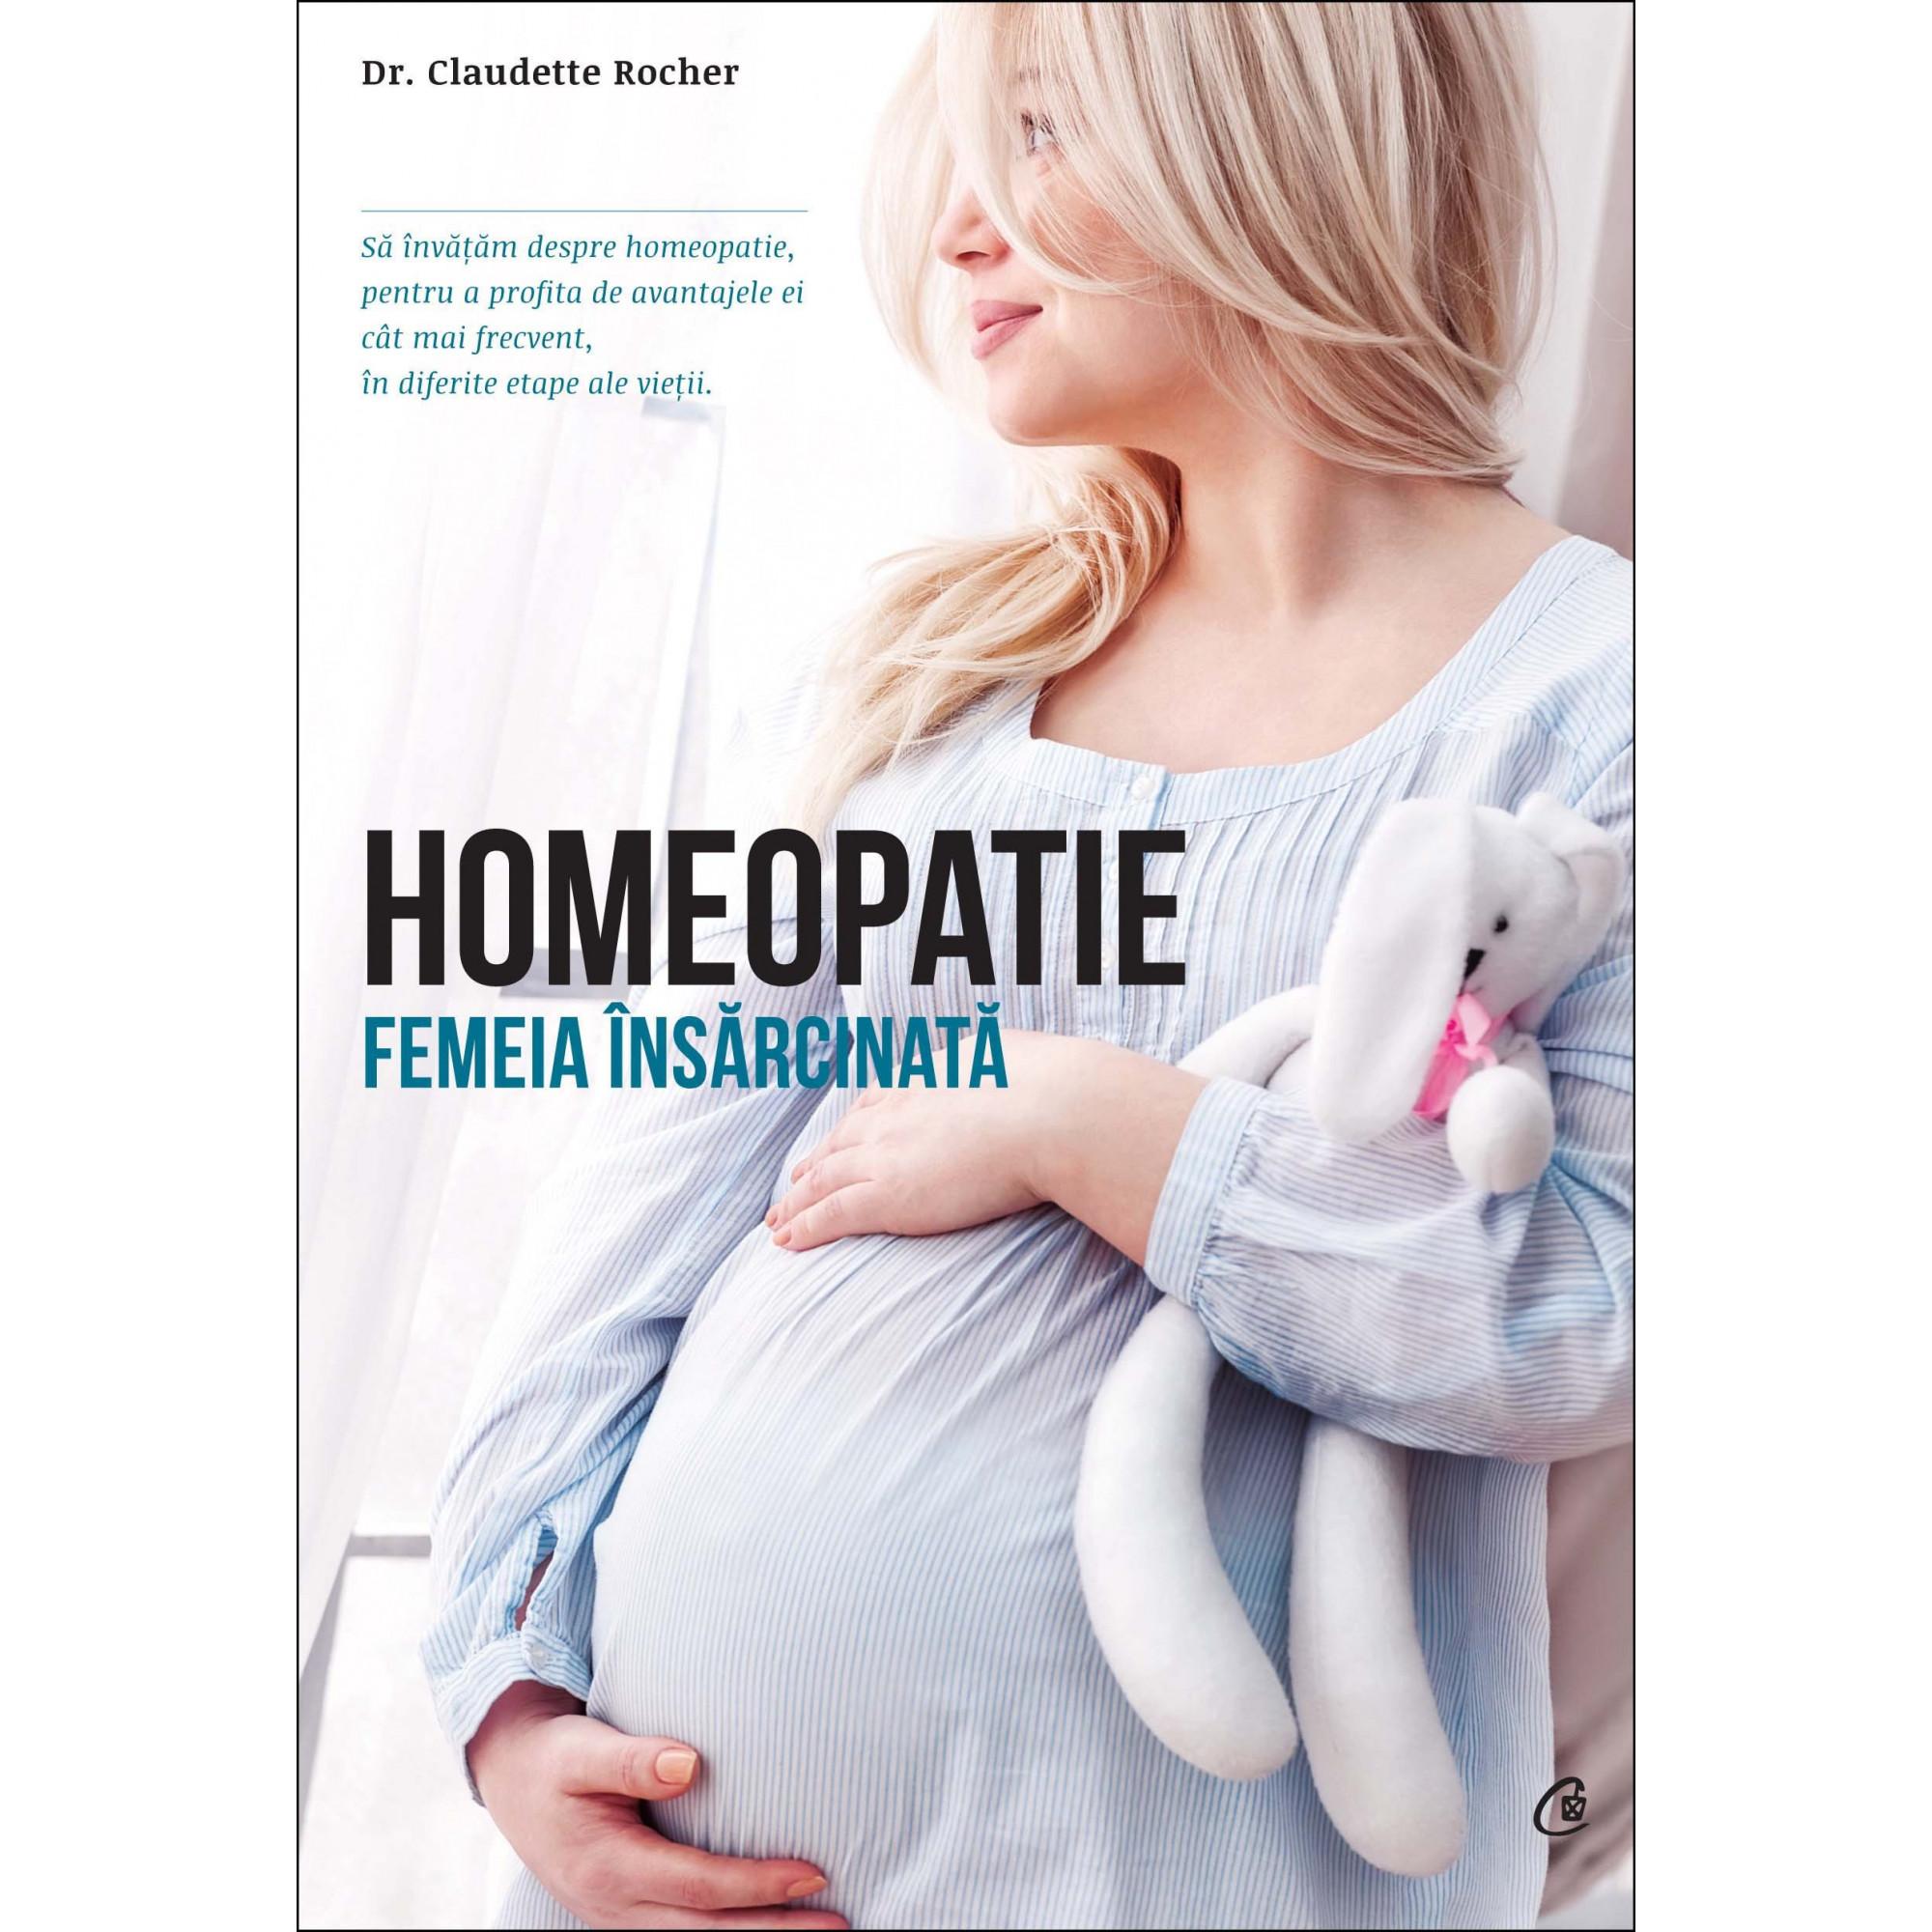 Homeopatie. Femeia insărcinată; Dr. Claudette Rocher